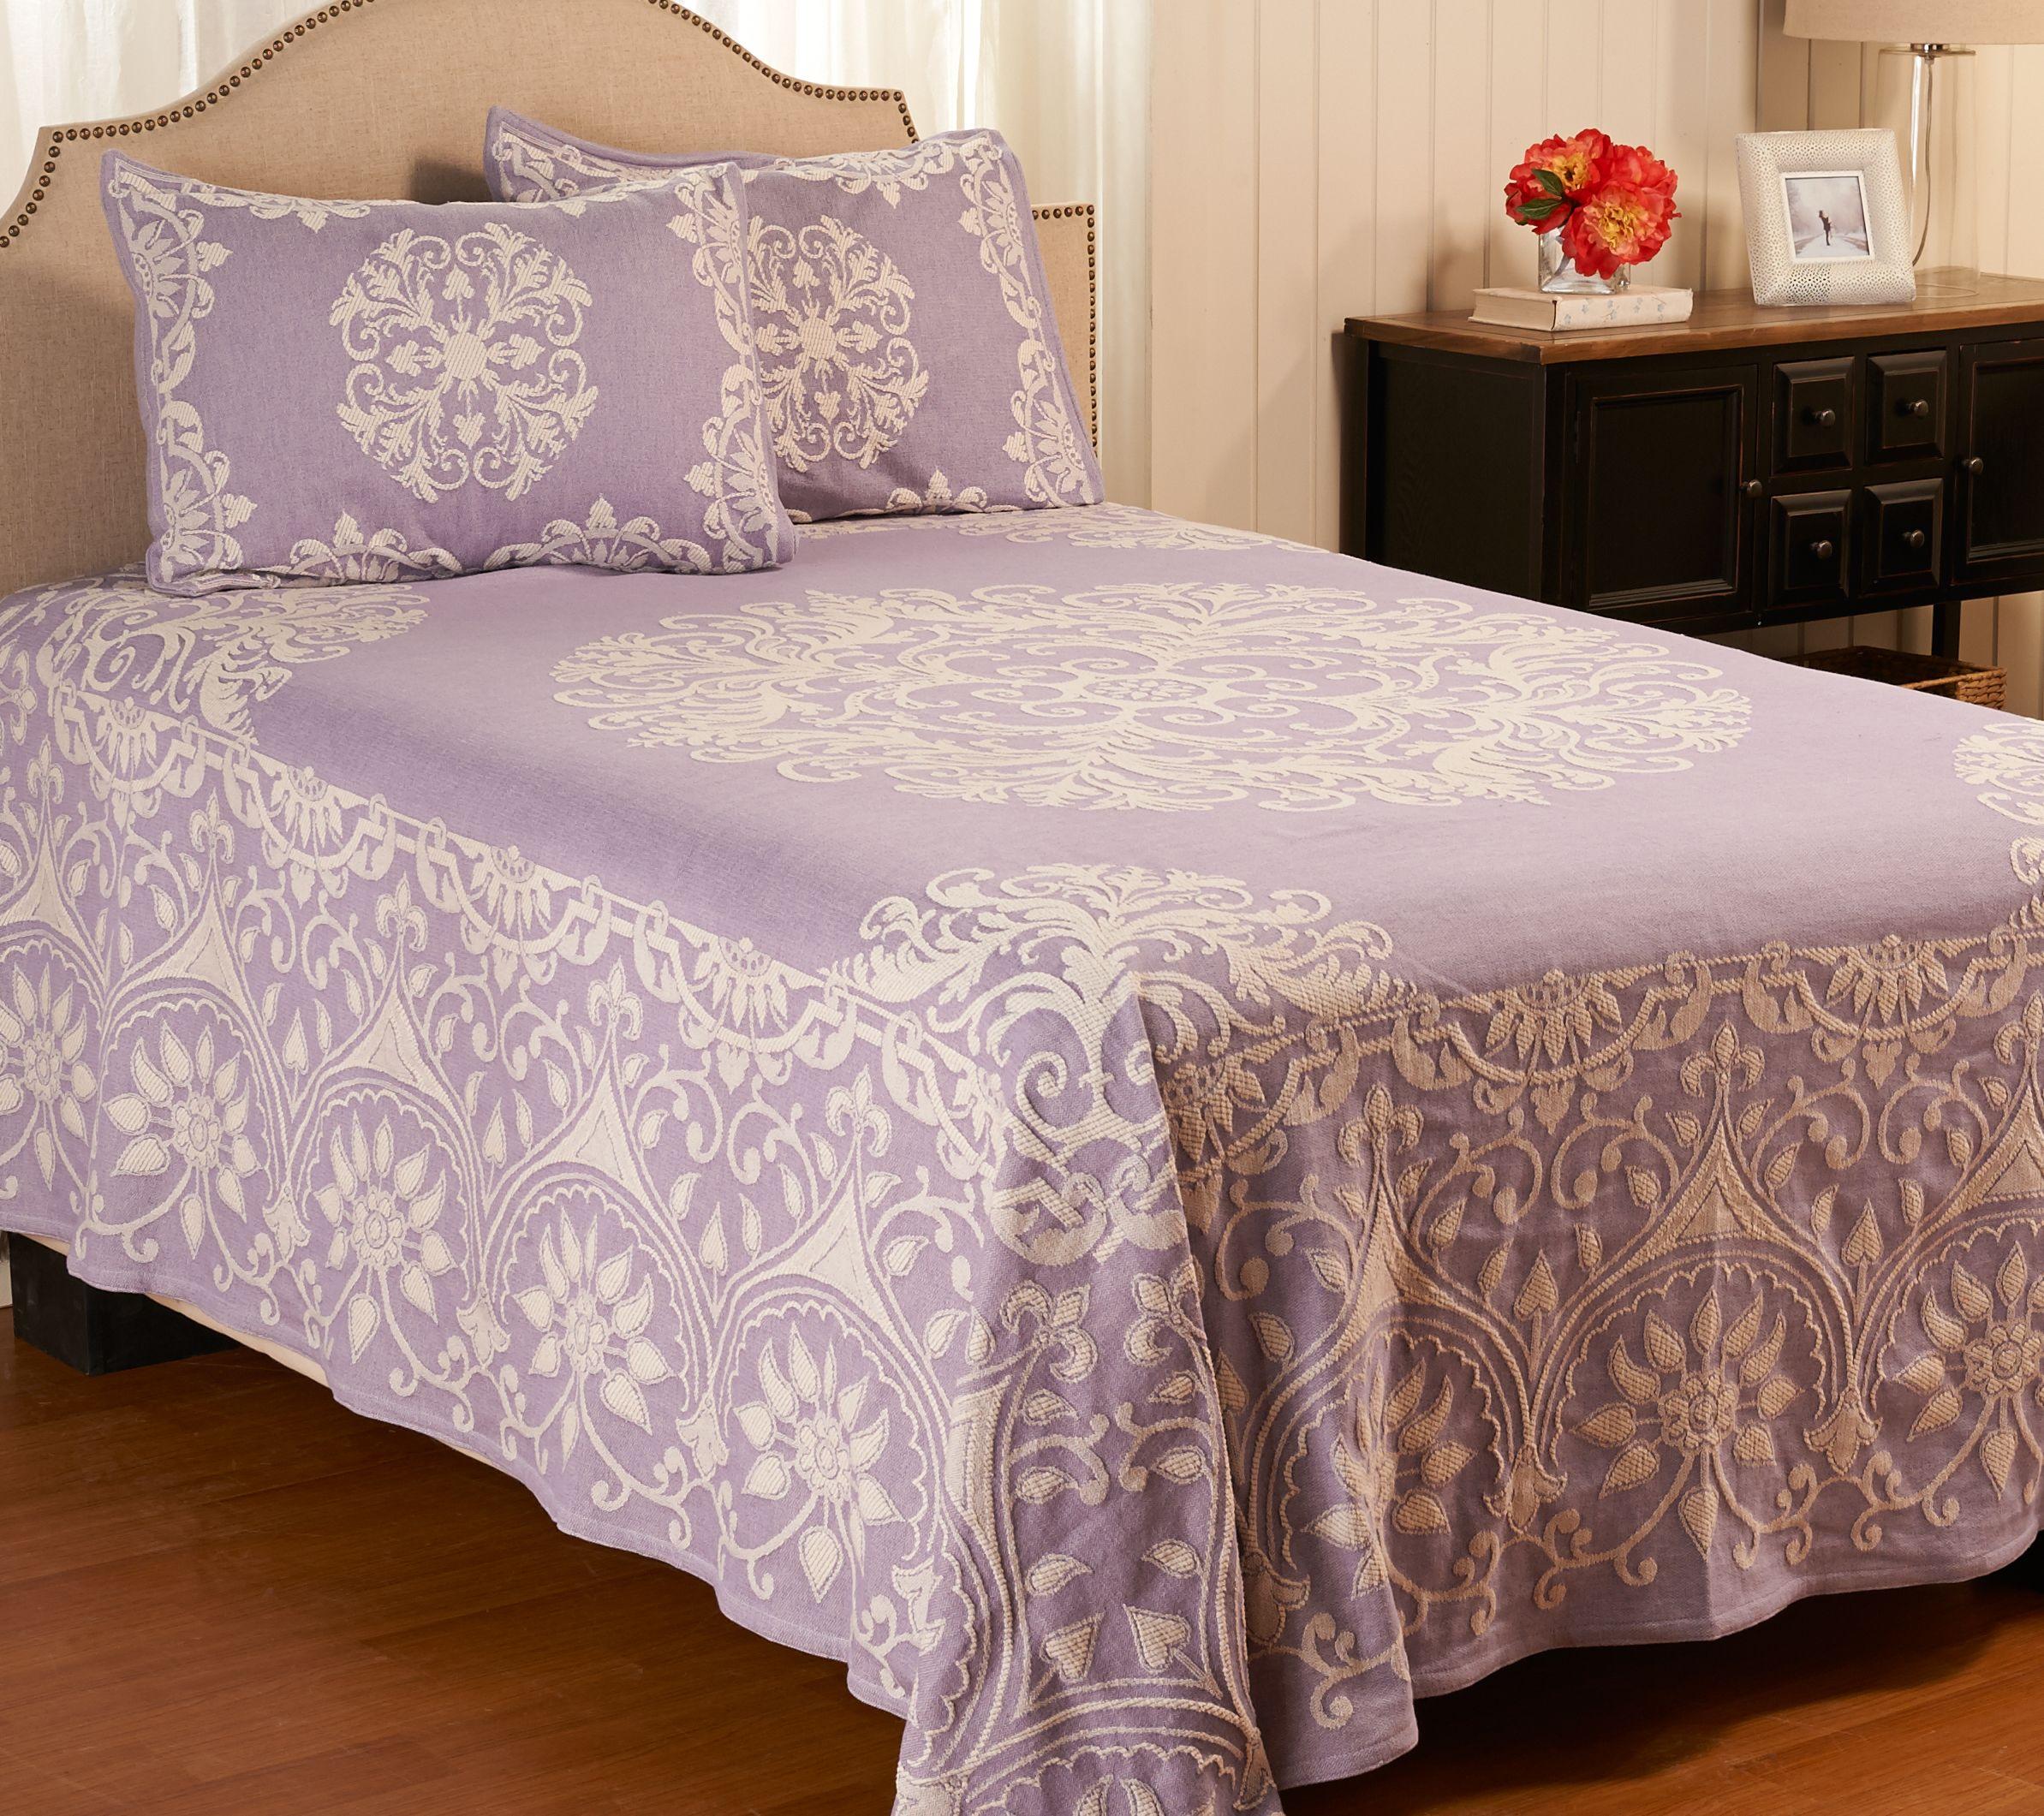 Light blue zebra print bedding - Medallion Jacquard 100 Cotton Qn Bedspread With Shams H207672